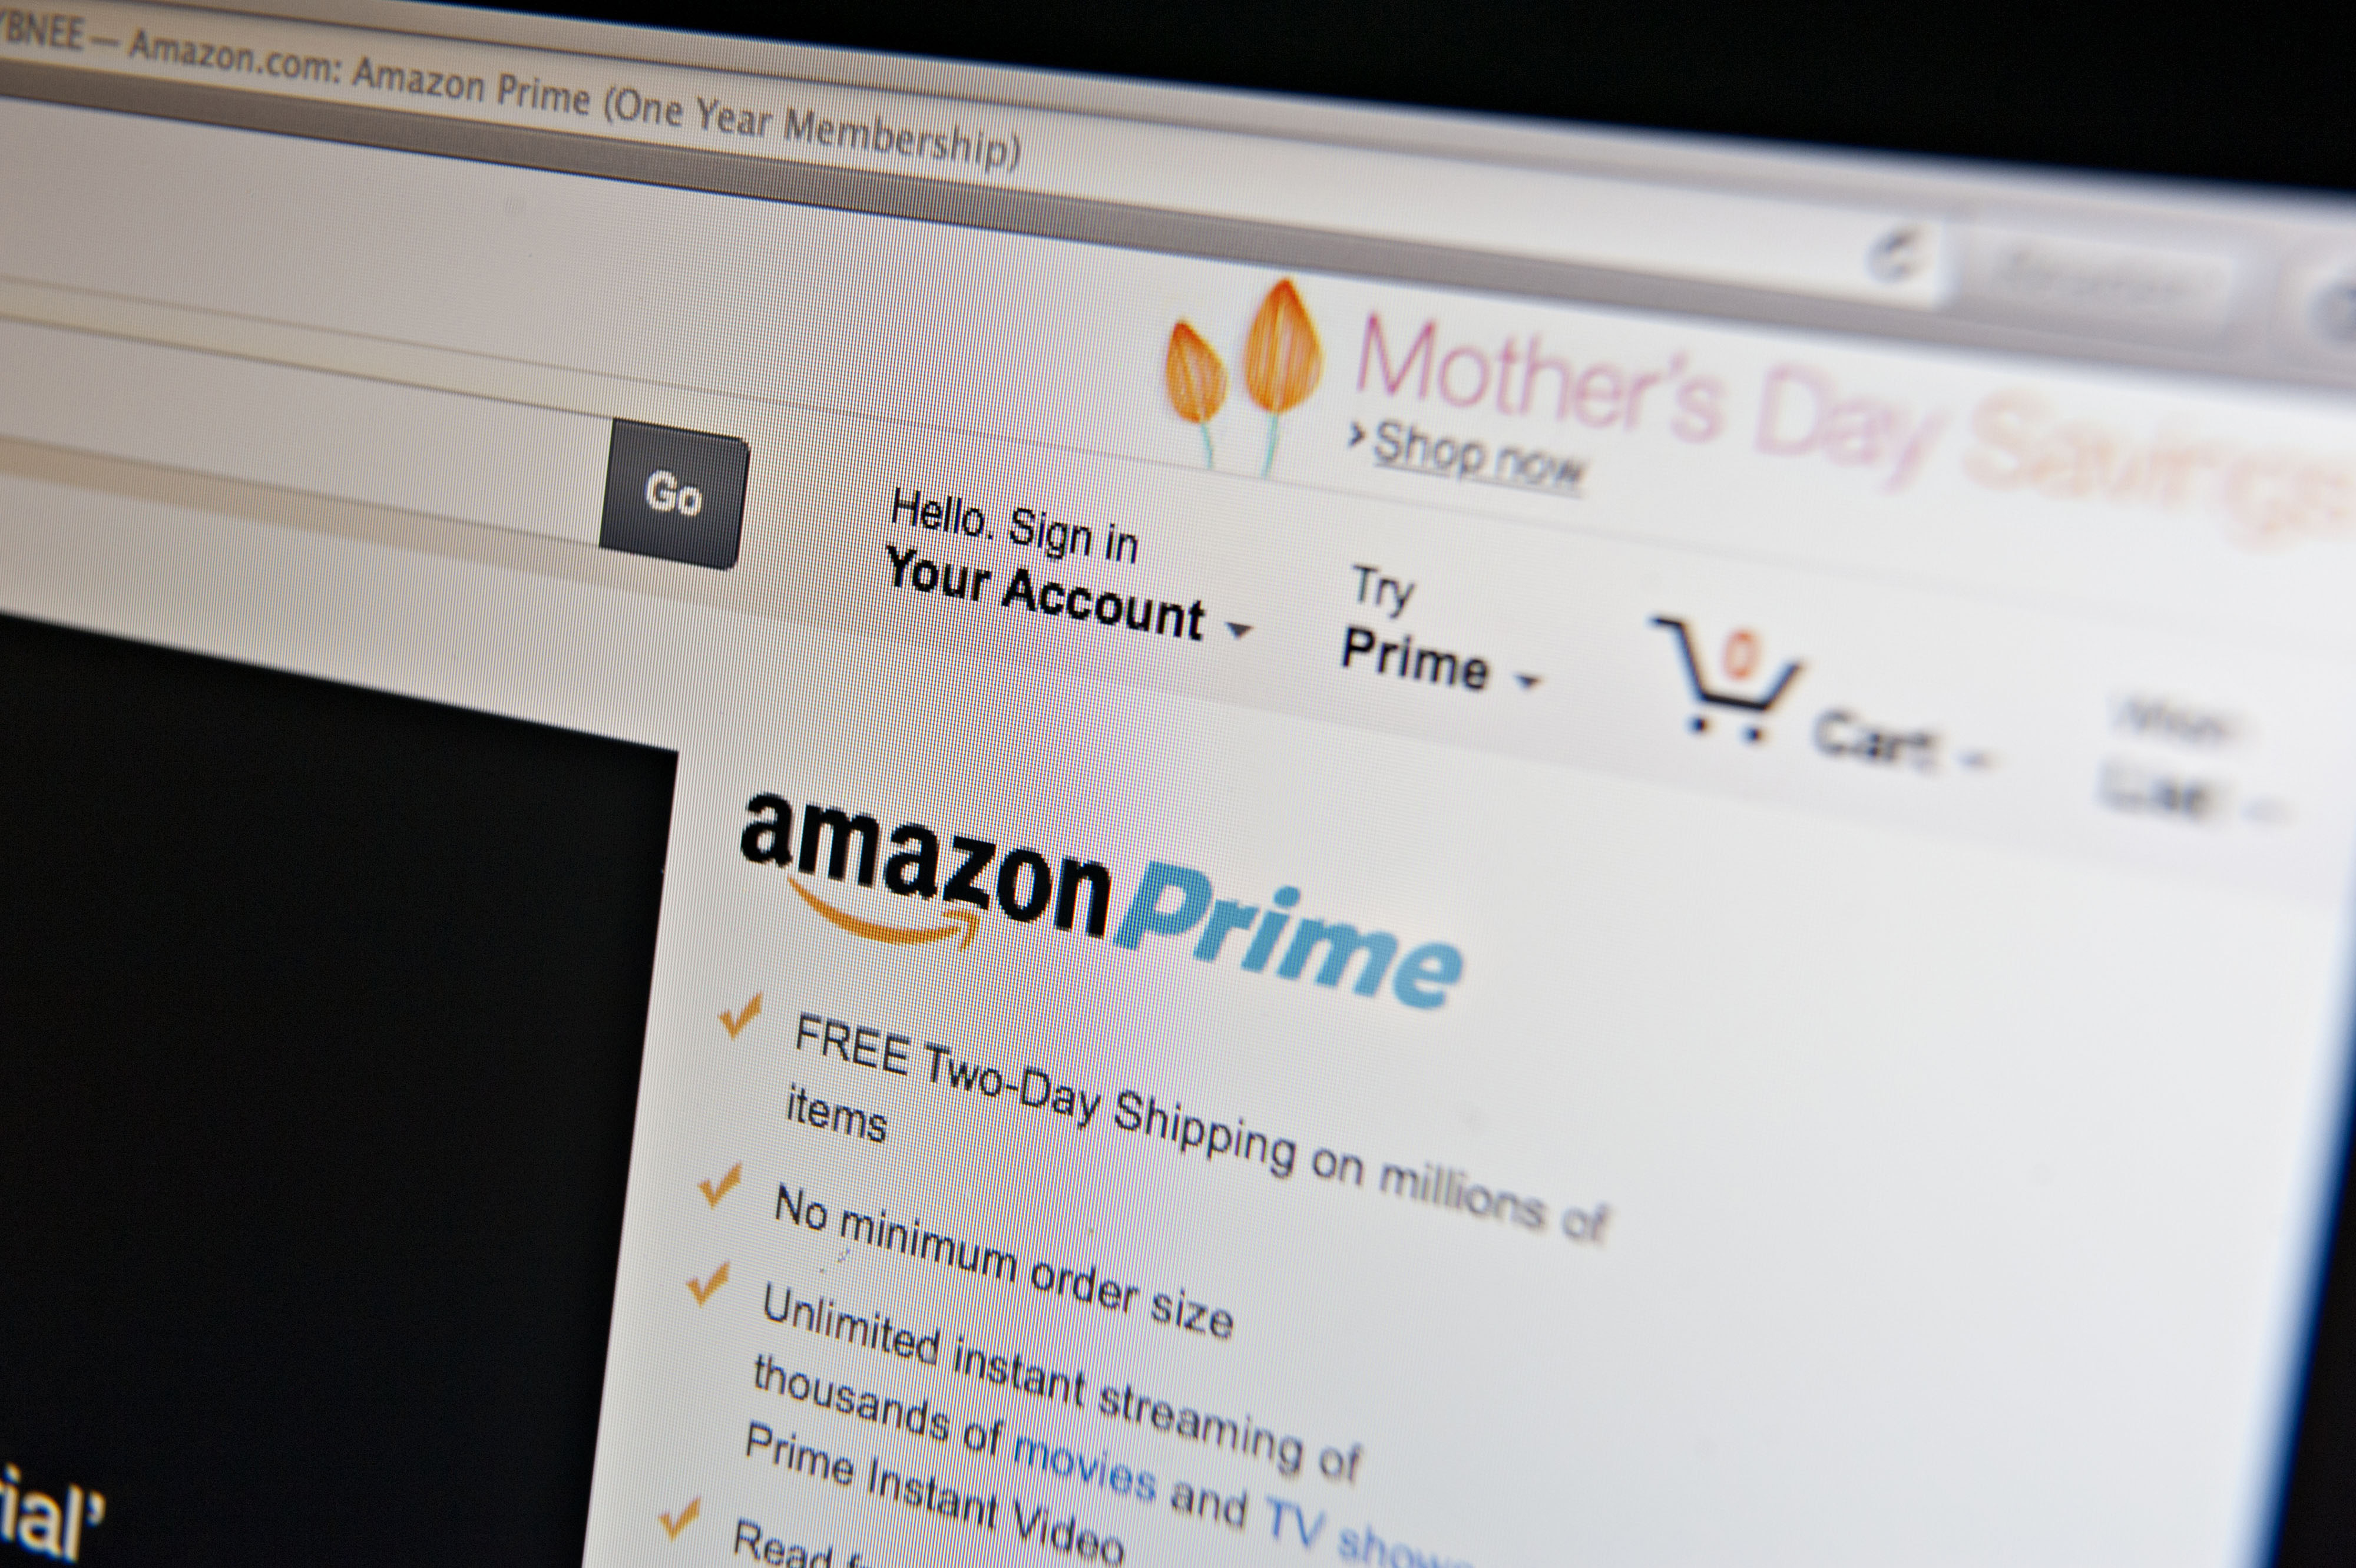 Amazon.com Illustrations Ahead Of Earnings Figures